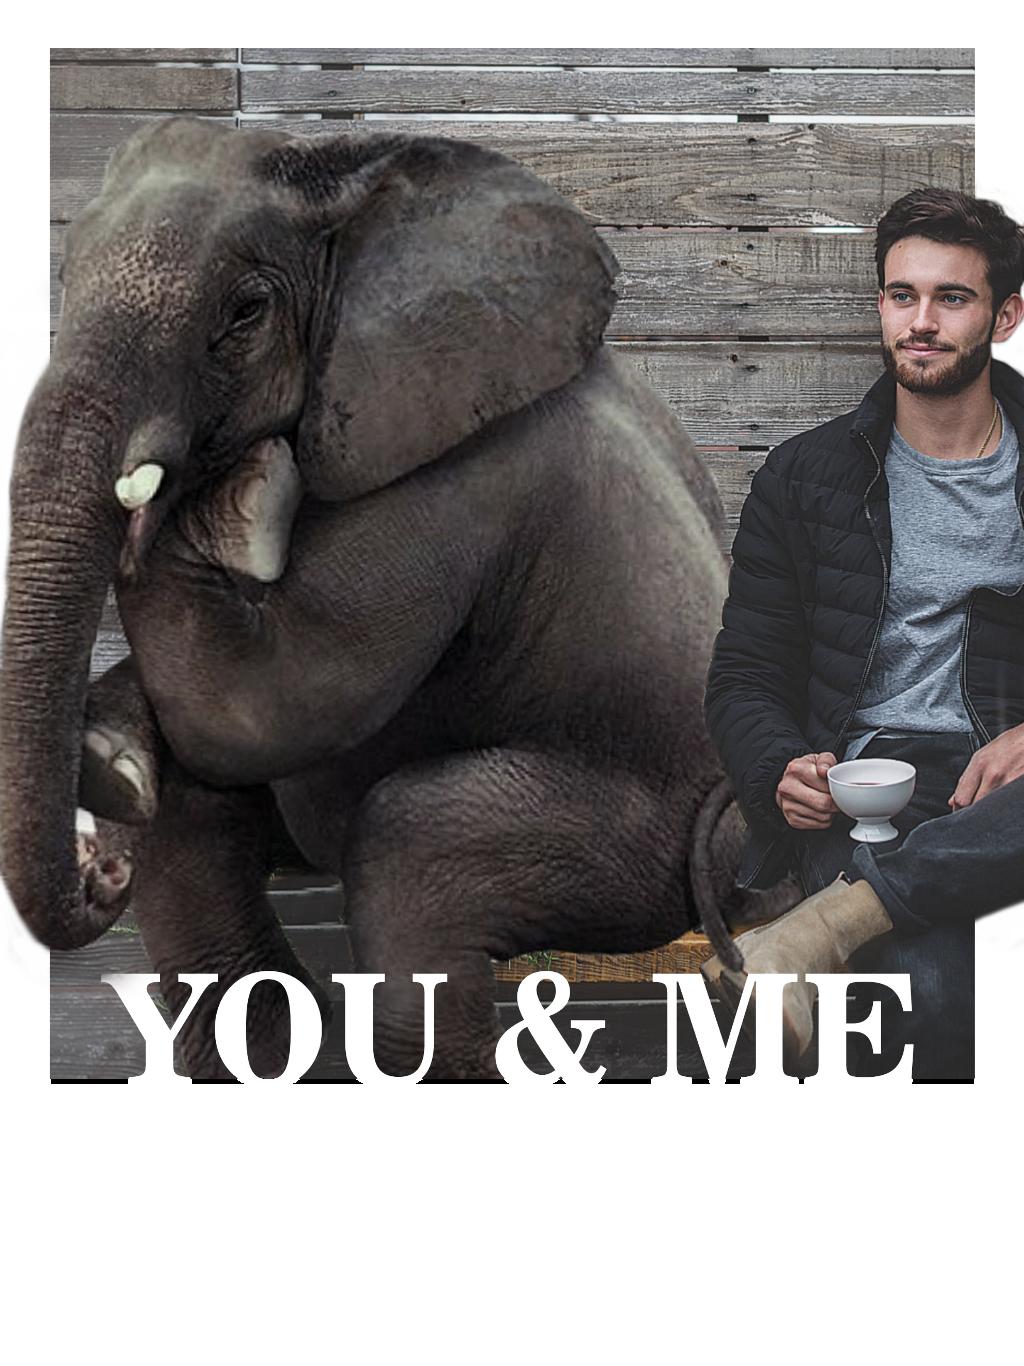 #freetoedit#madewithpicsart#love#elephant#men#cool#beauty#nice#friends#friend#remix#remixit#fun#lol#wonderful#weekend#mrlb2000 @pa @freetoedit happy Weekend ☺️☕